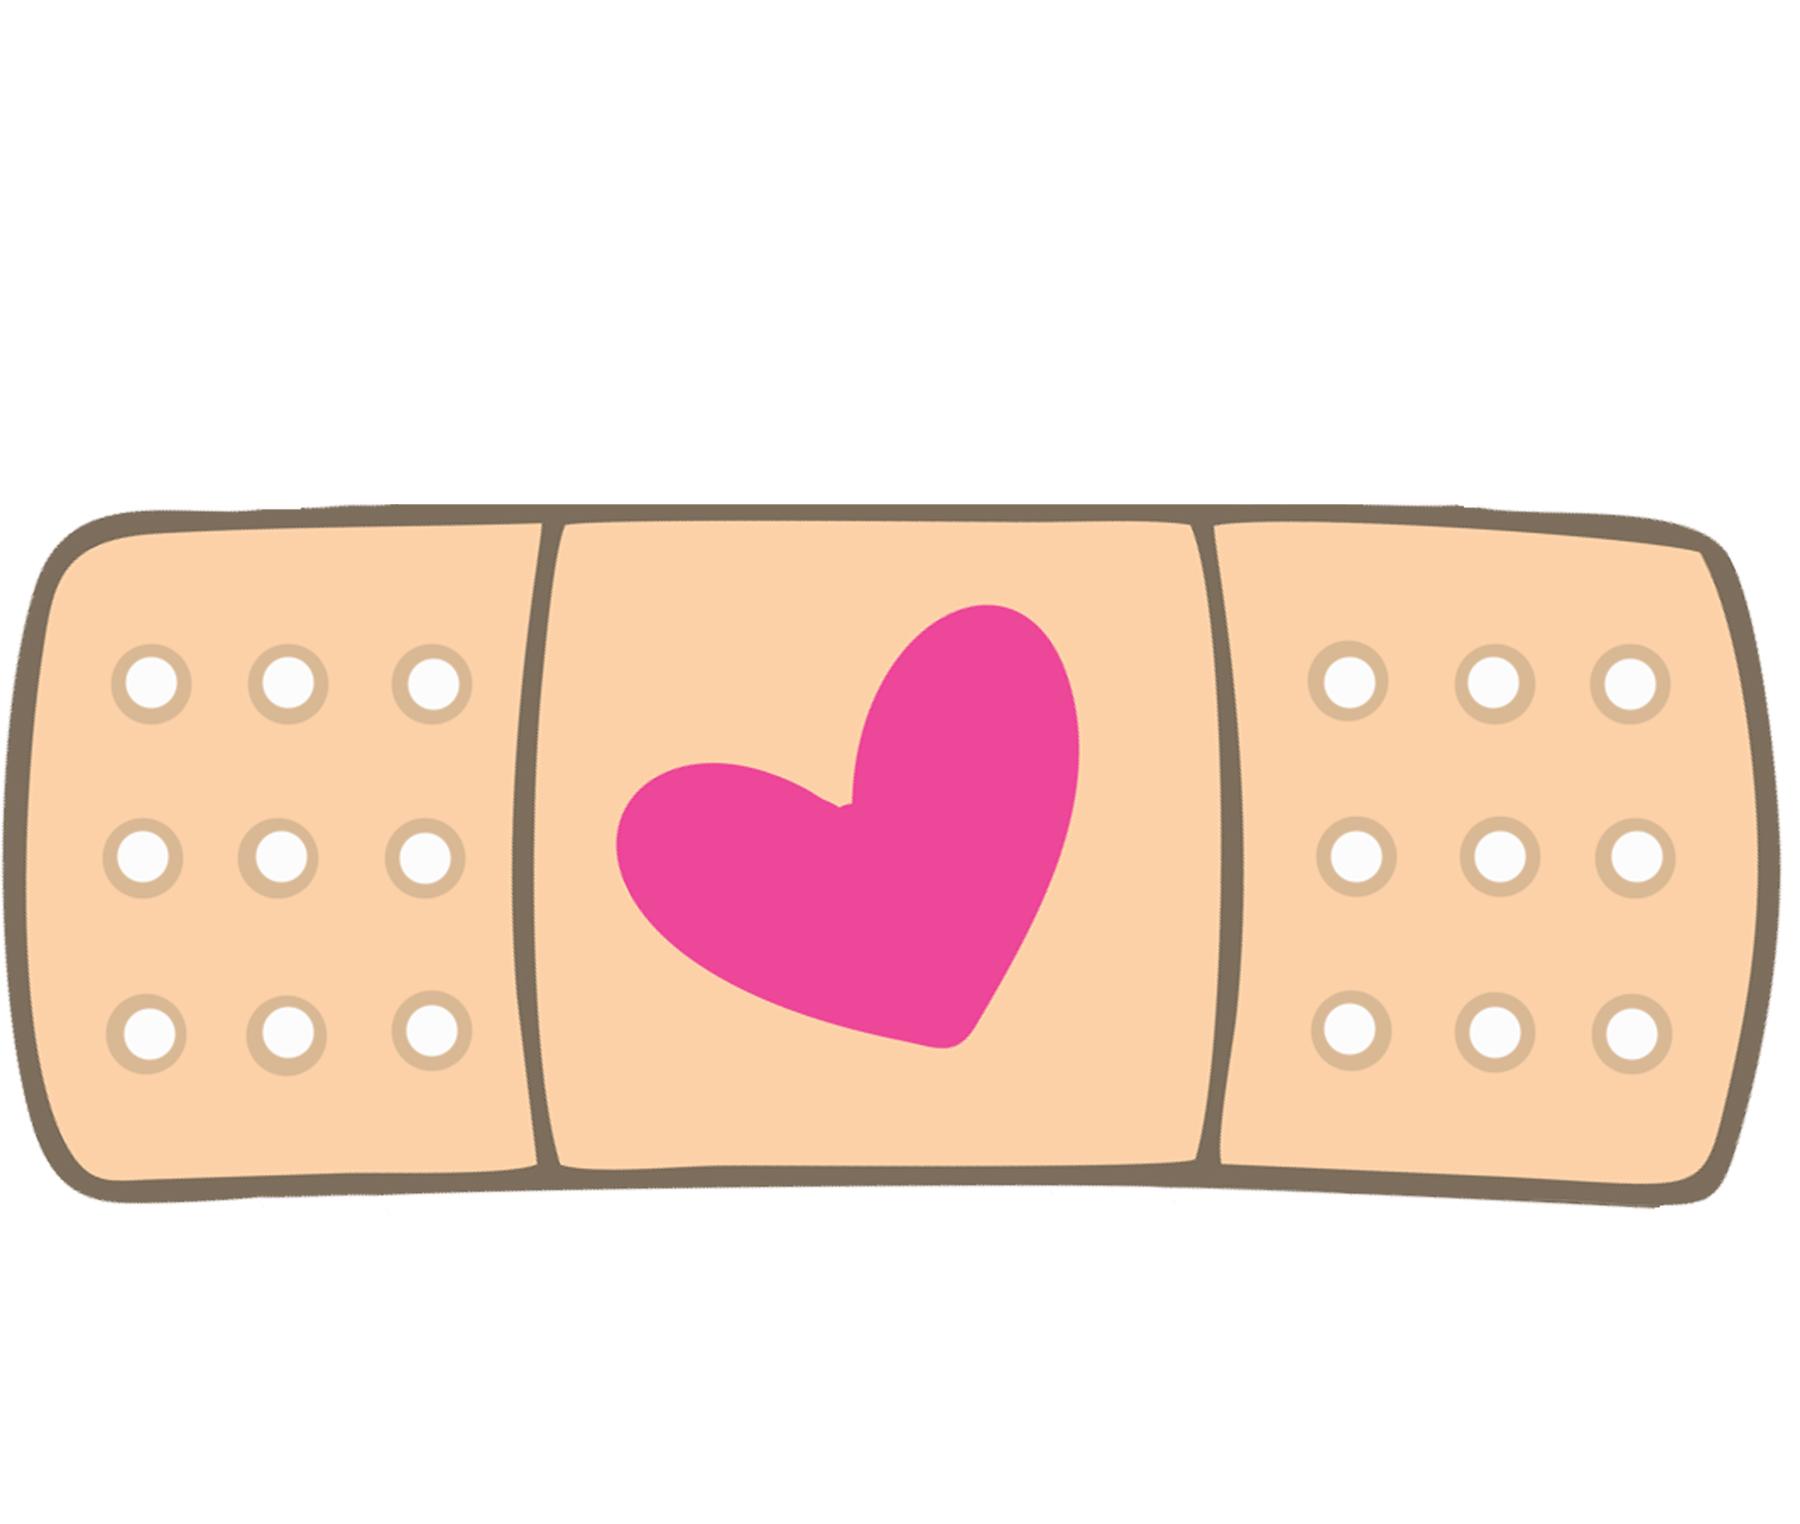 Bandaid band aid clip art clipart image